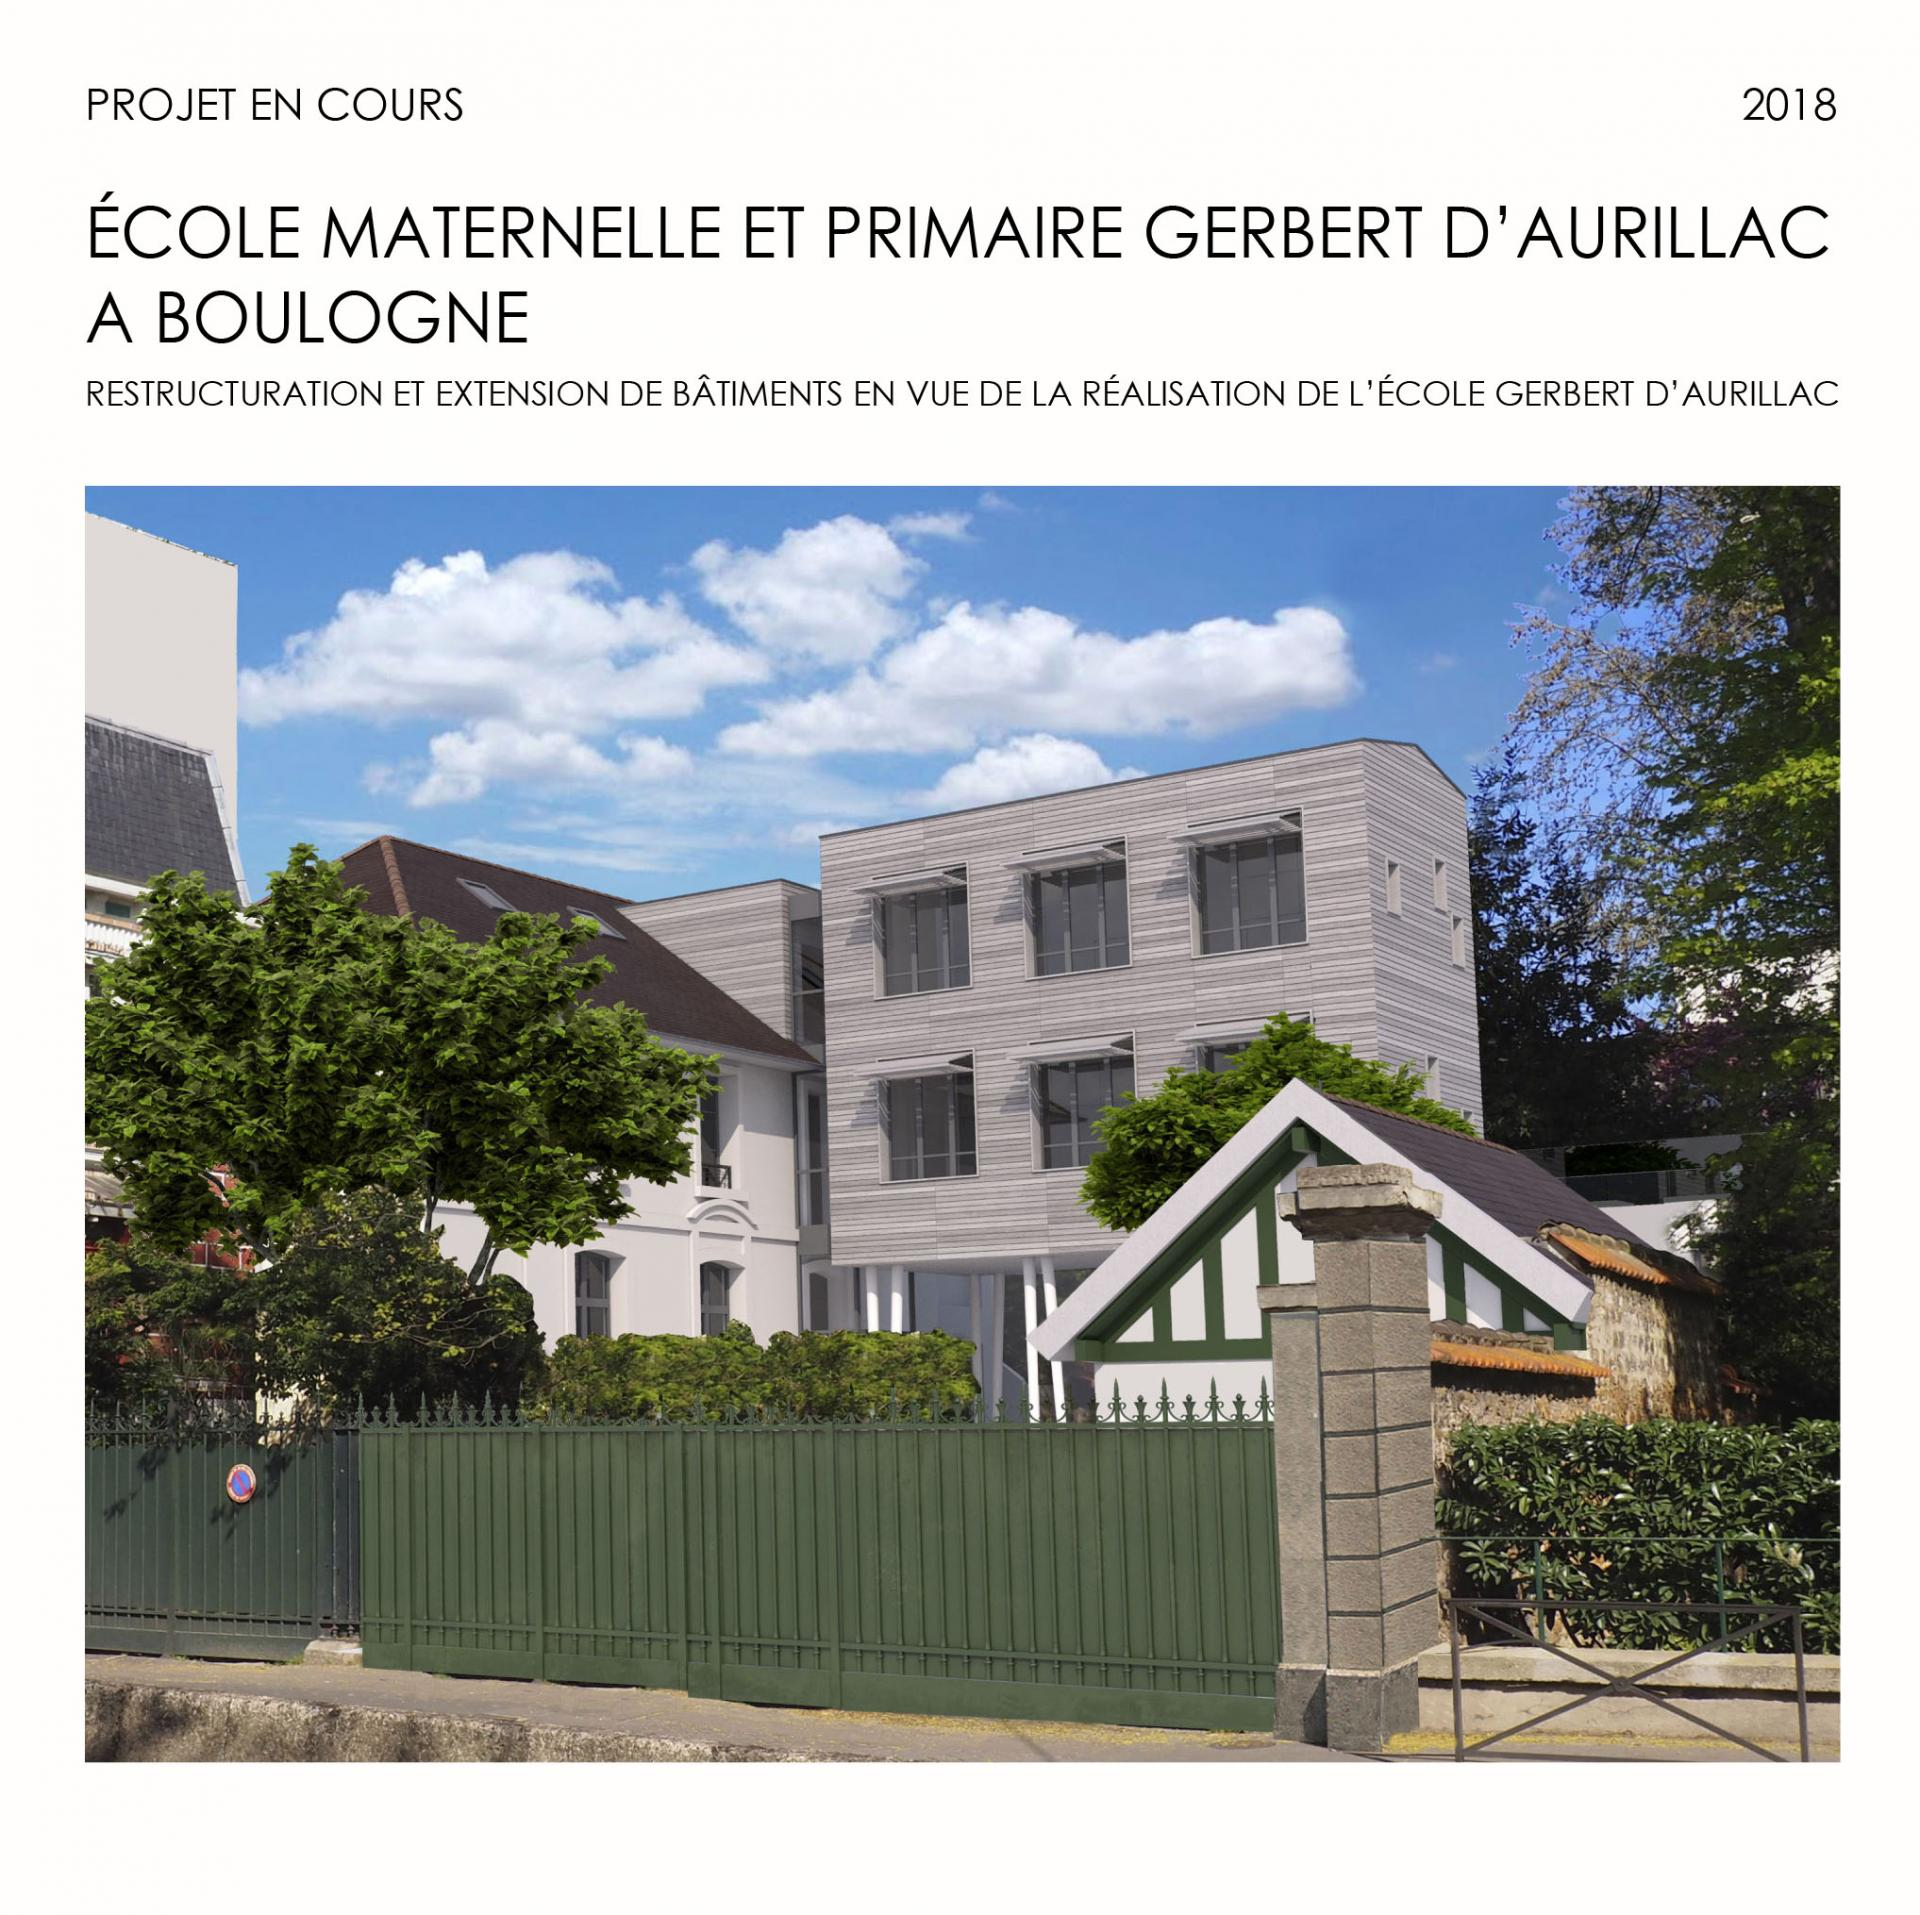 2018 ecole gerbert d aurillac boulogne 7